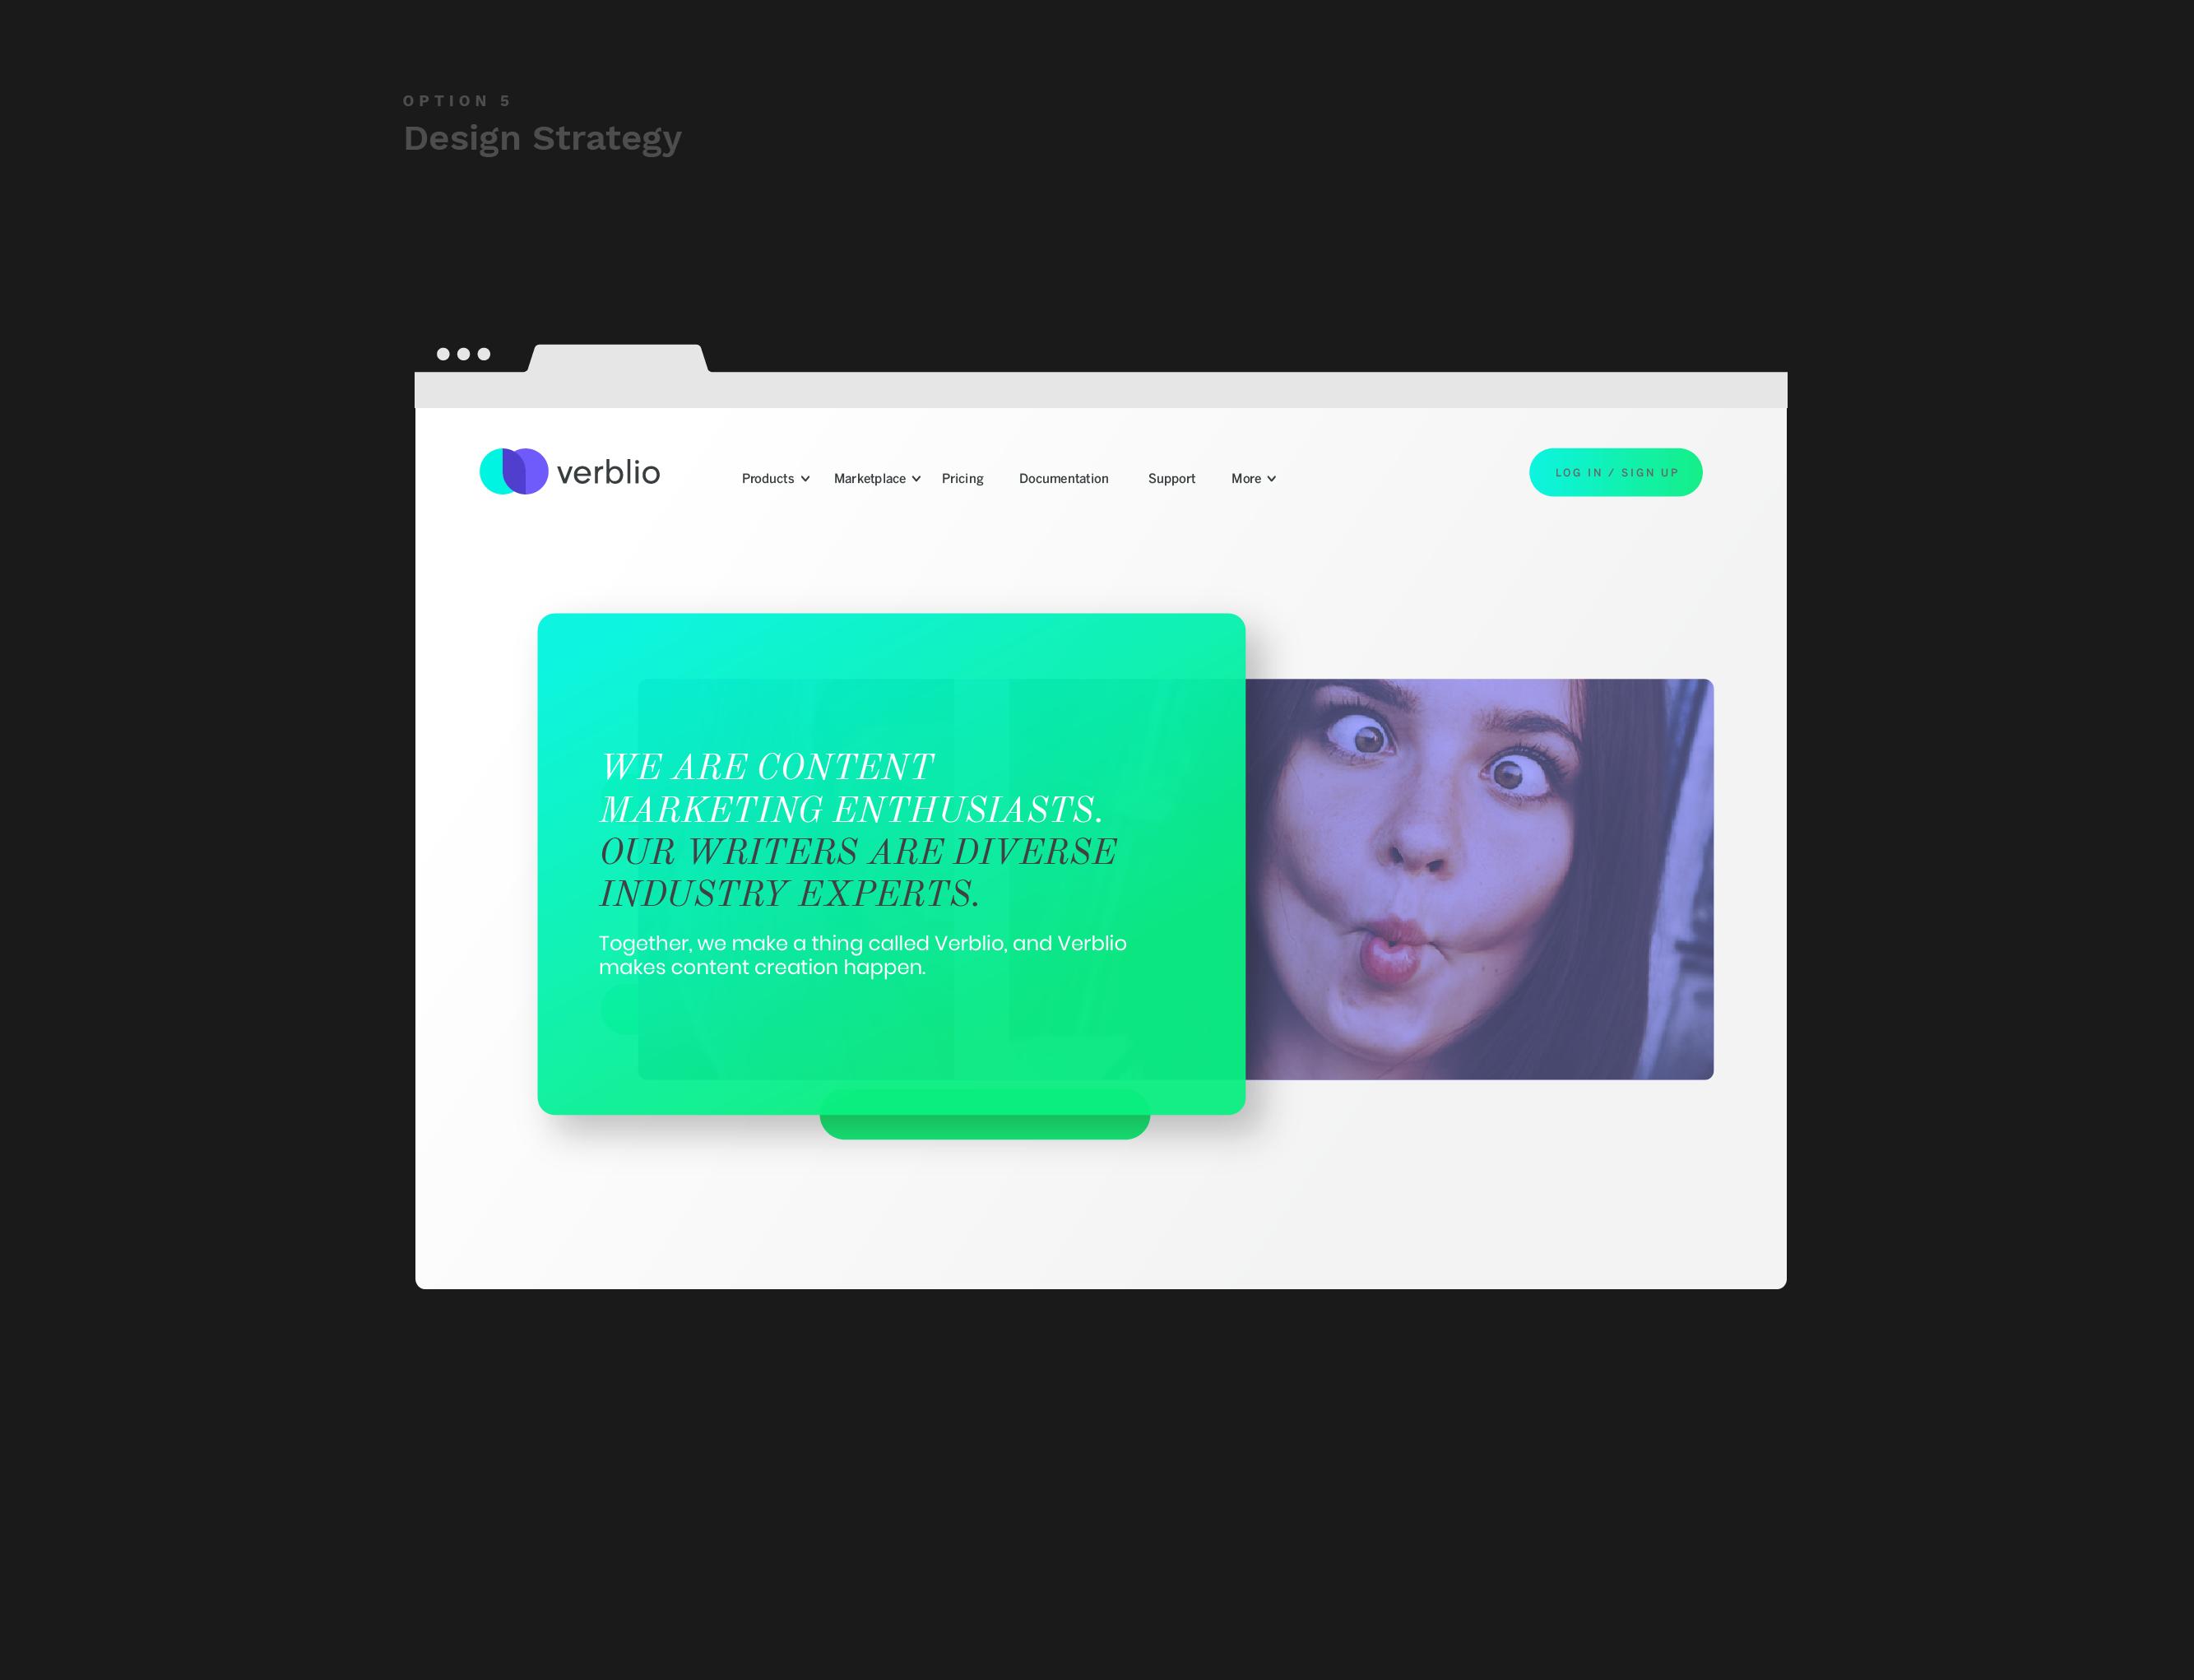 verblio-rebrand-visual-design-branding